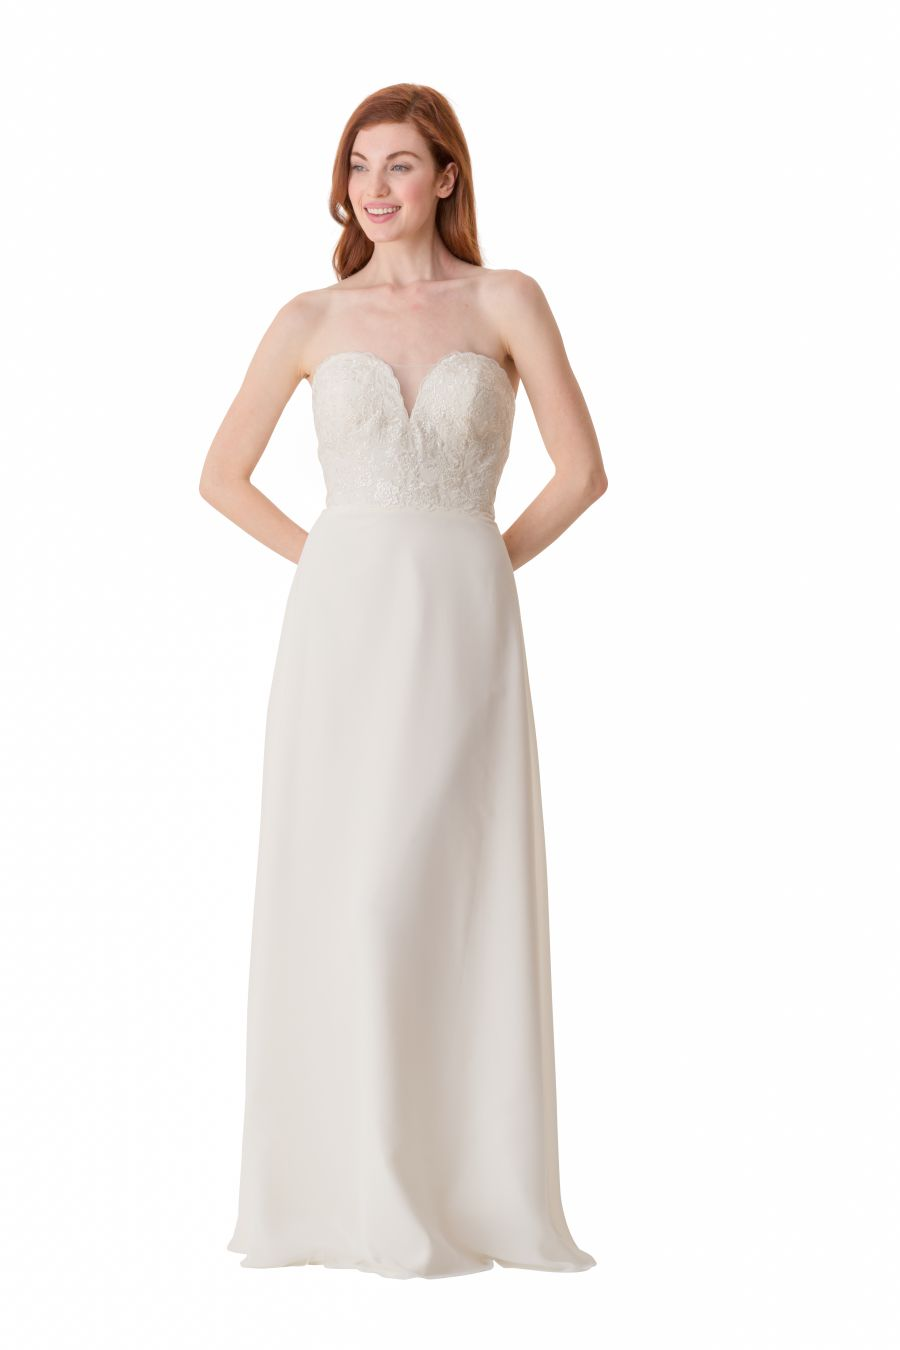 bari jay whites 2065 sequin bodice destination wedding dress french novelty. Black Bedroom Furniture Sets. Home Design Ideas